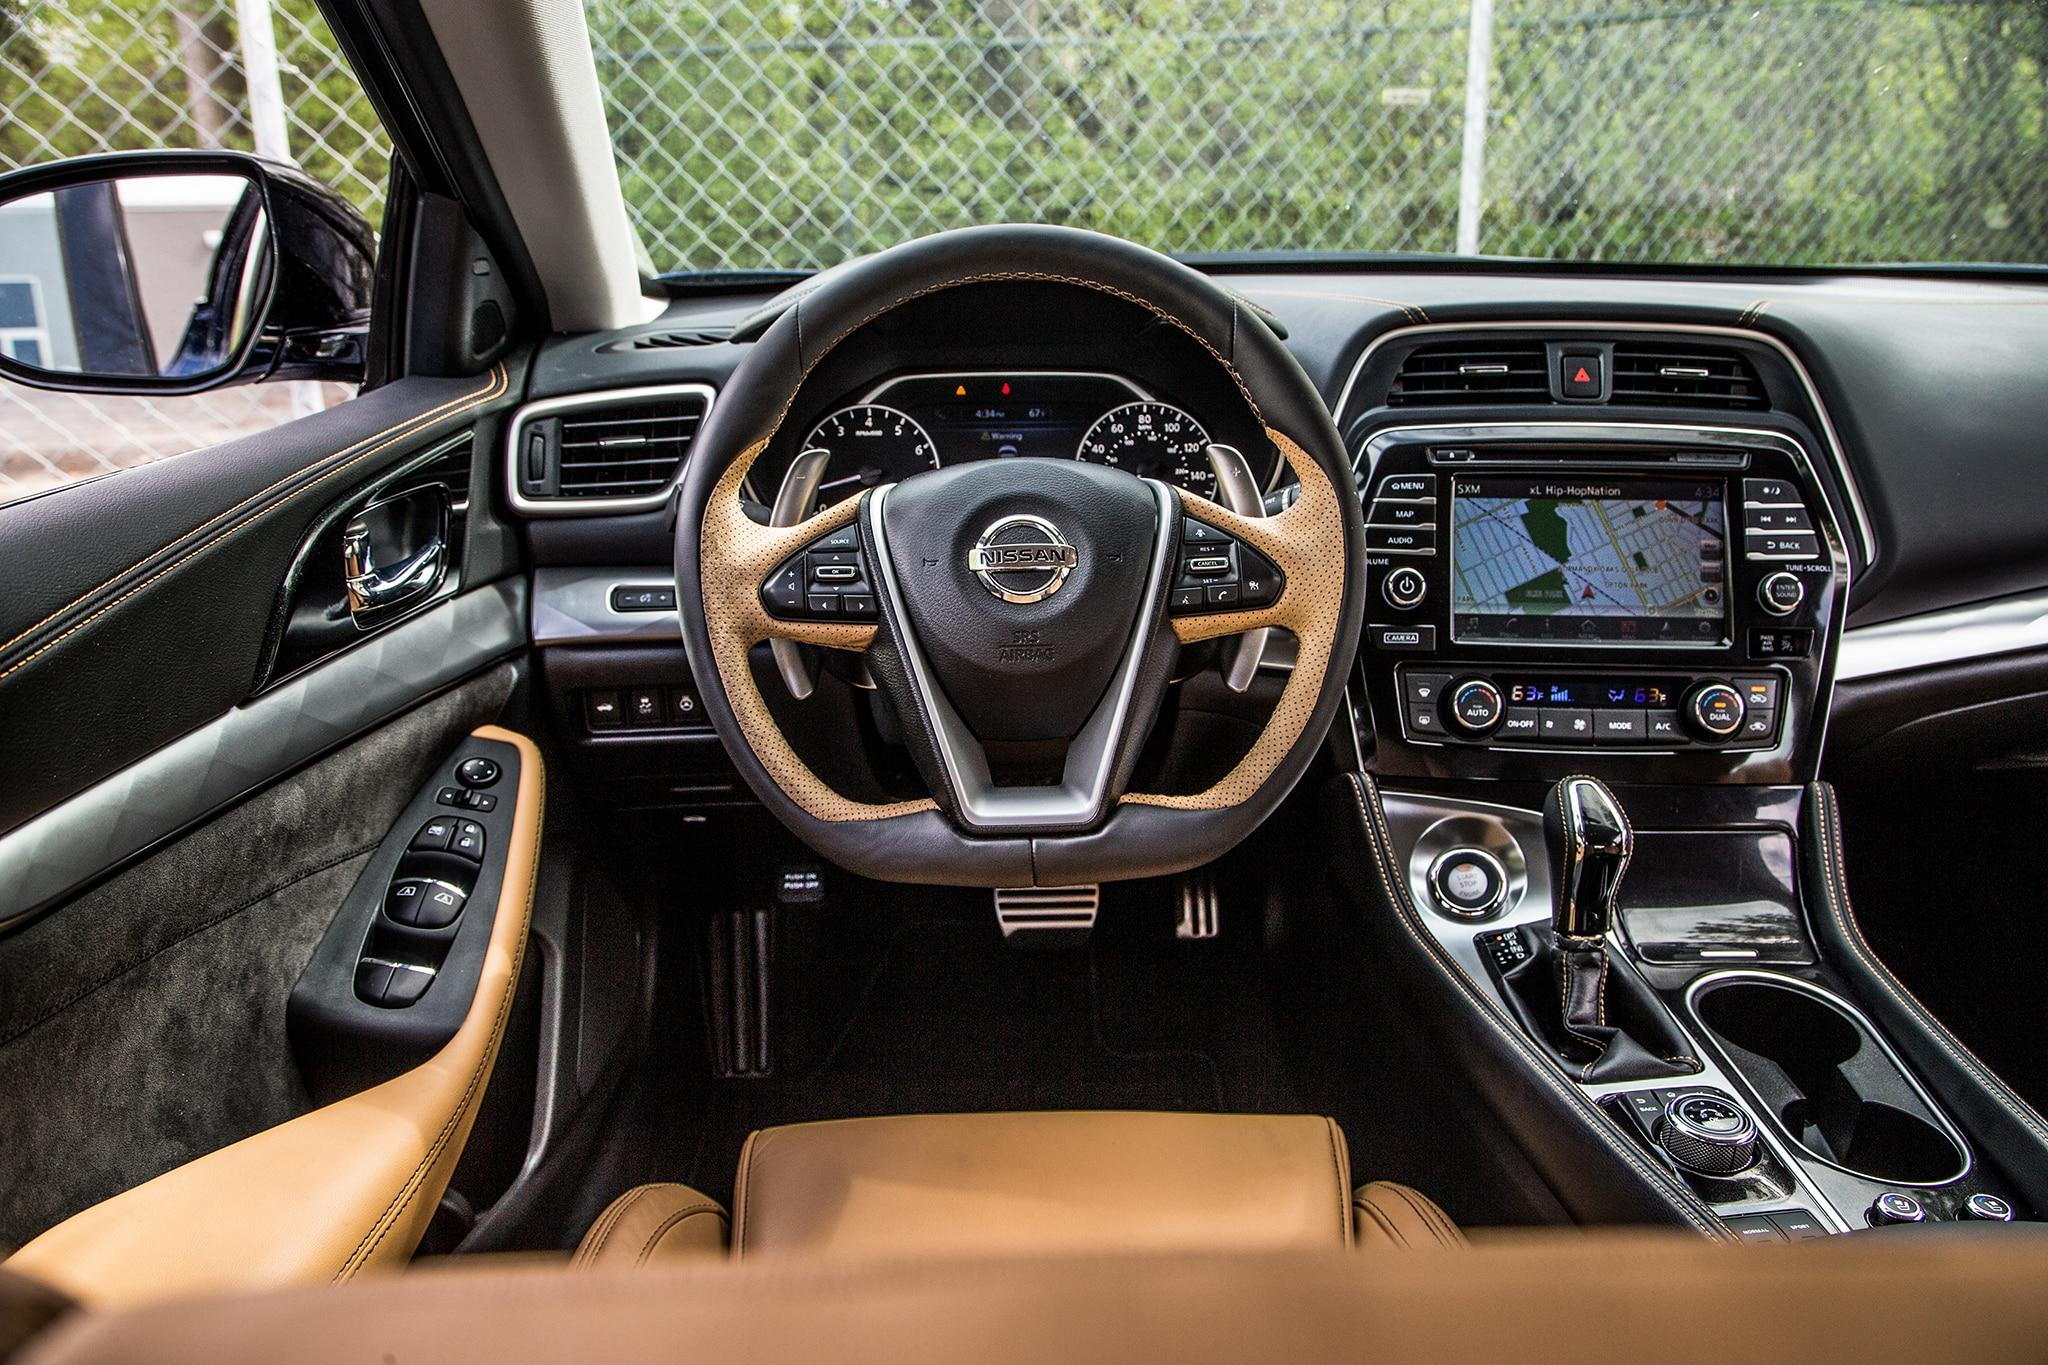 22 Inch Wheels Nissan Maxima